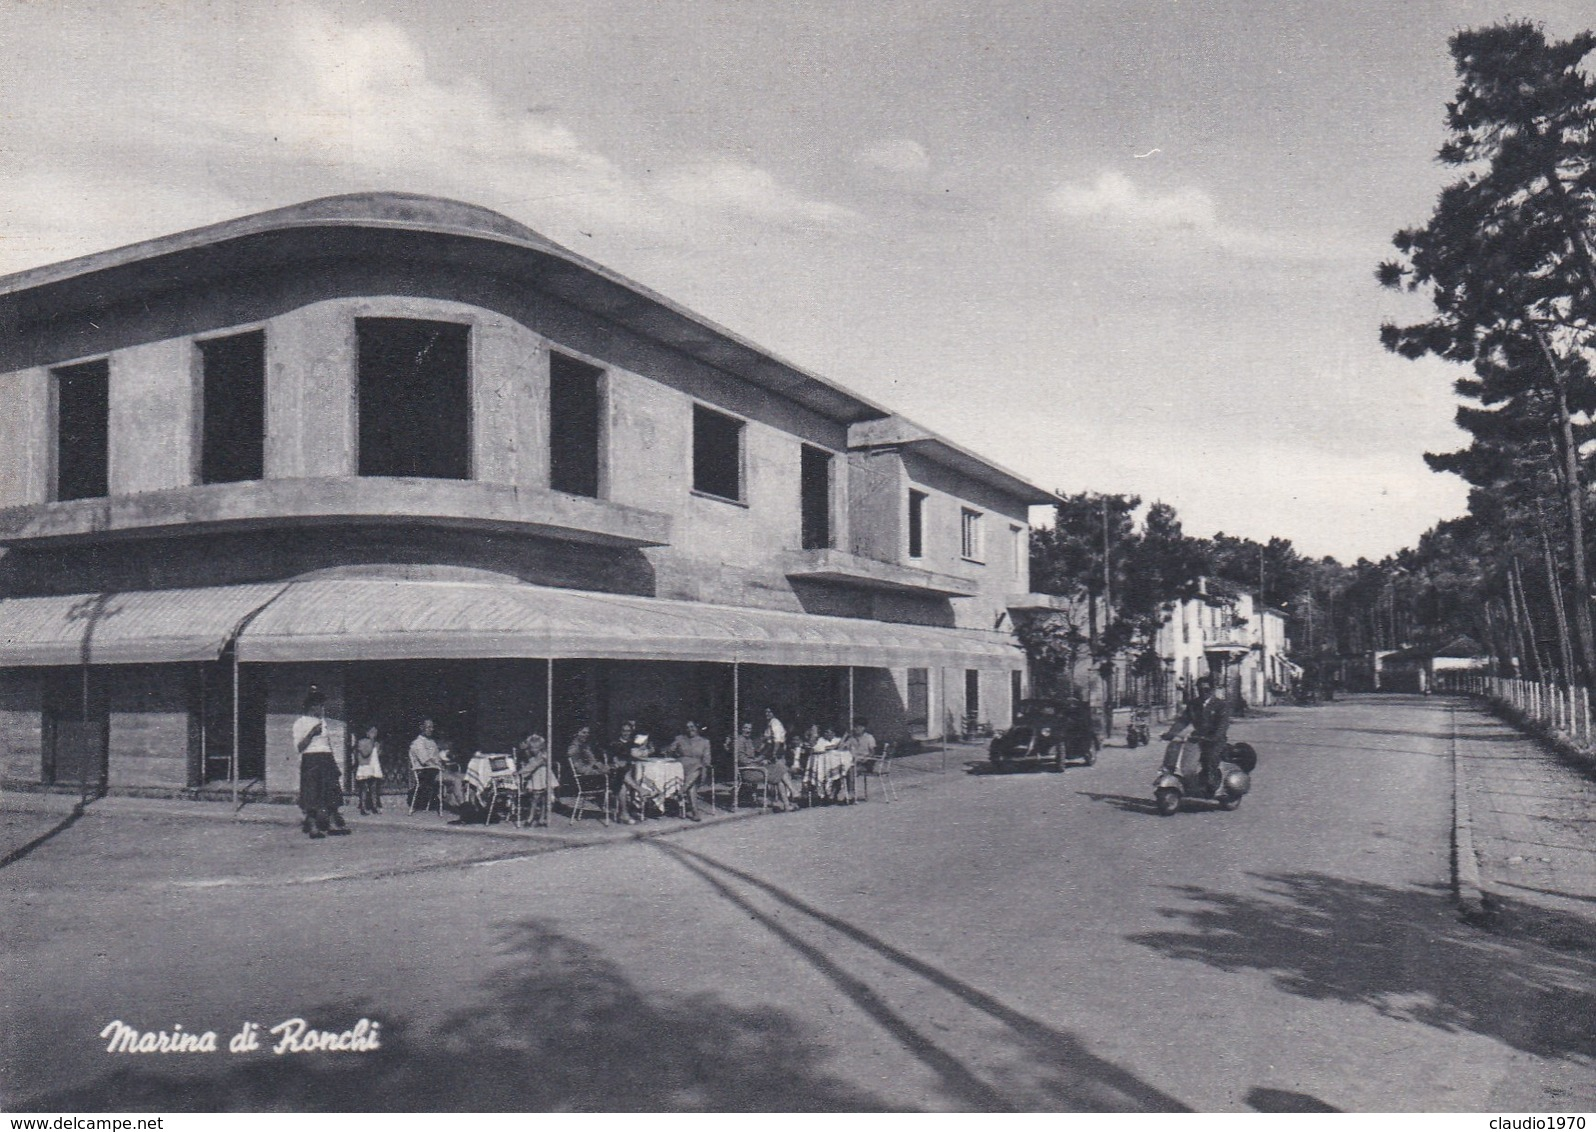 CARTOLINA - POSTCARD - MASSA - MARINA DI RONCHI - Massa